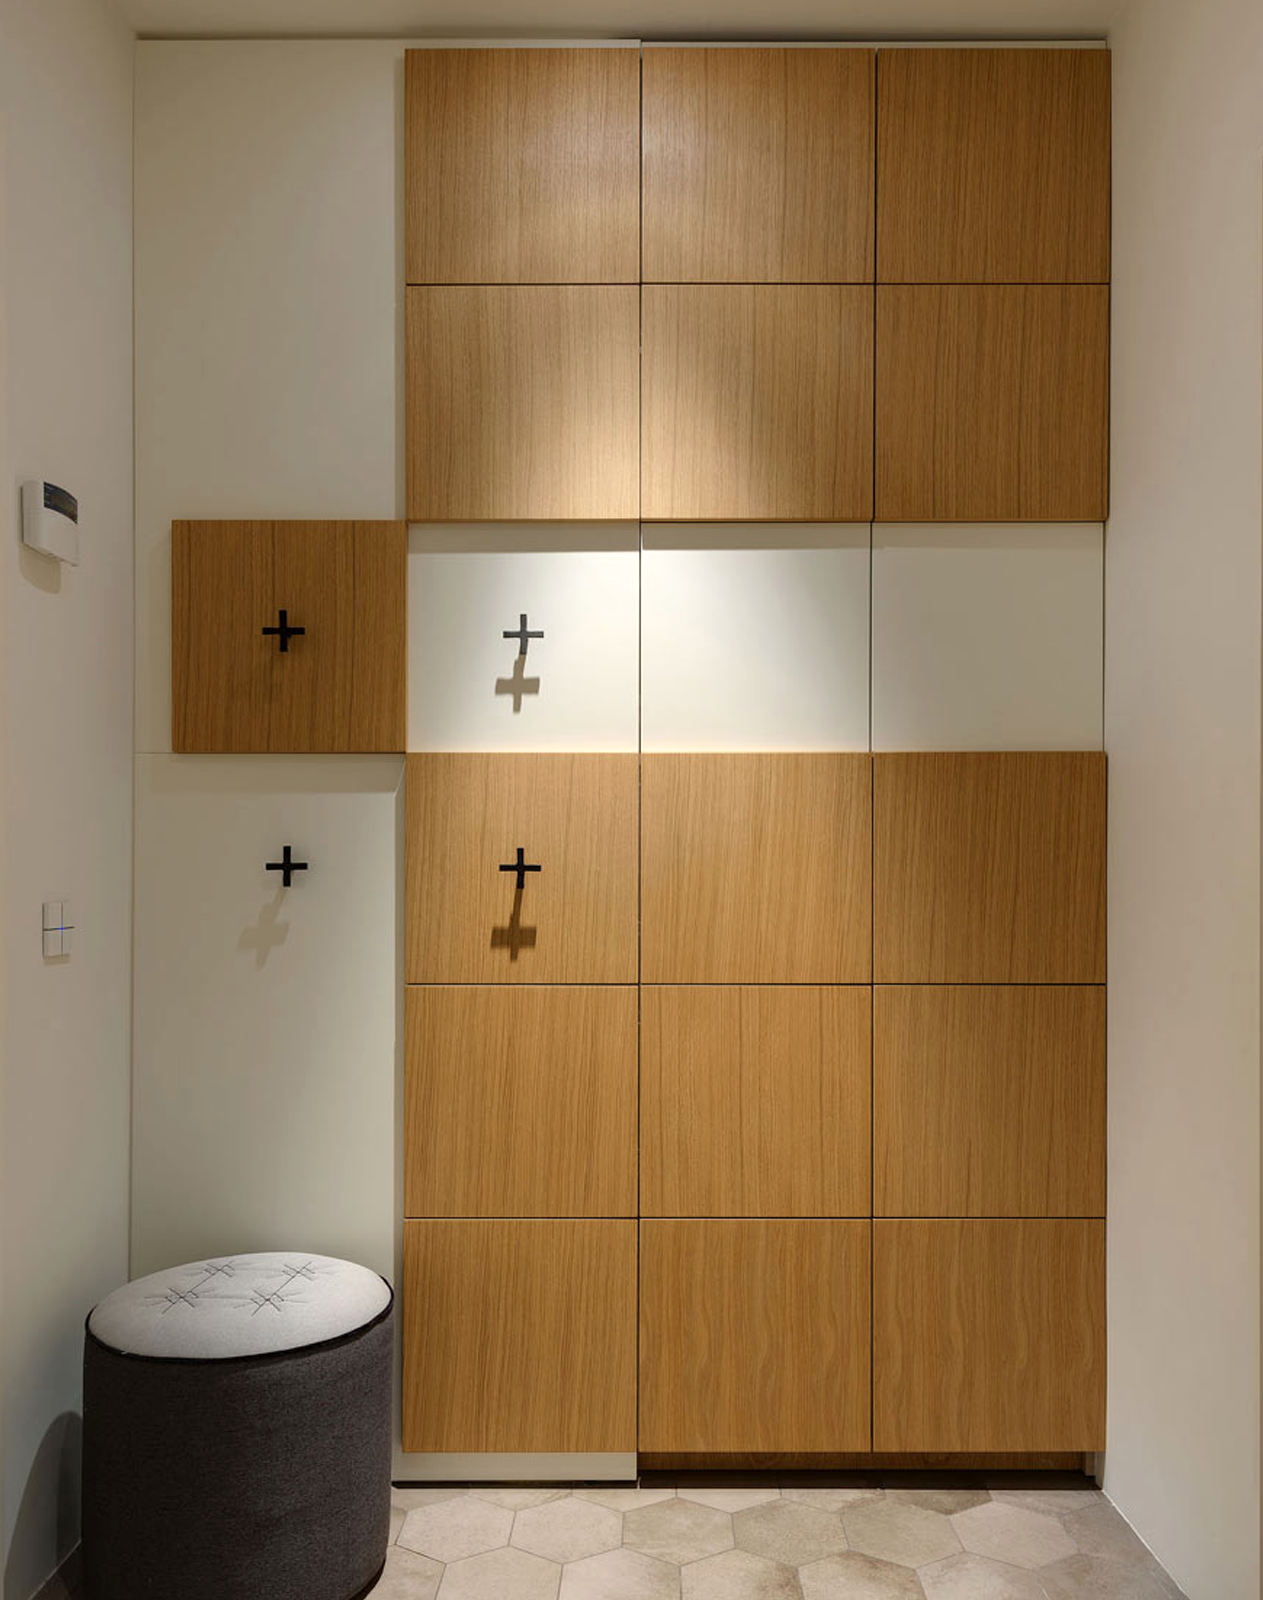 ki-design-studio-depa-resbaladilla-casa-9